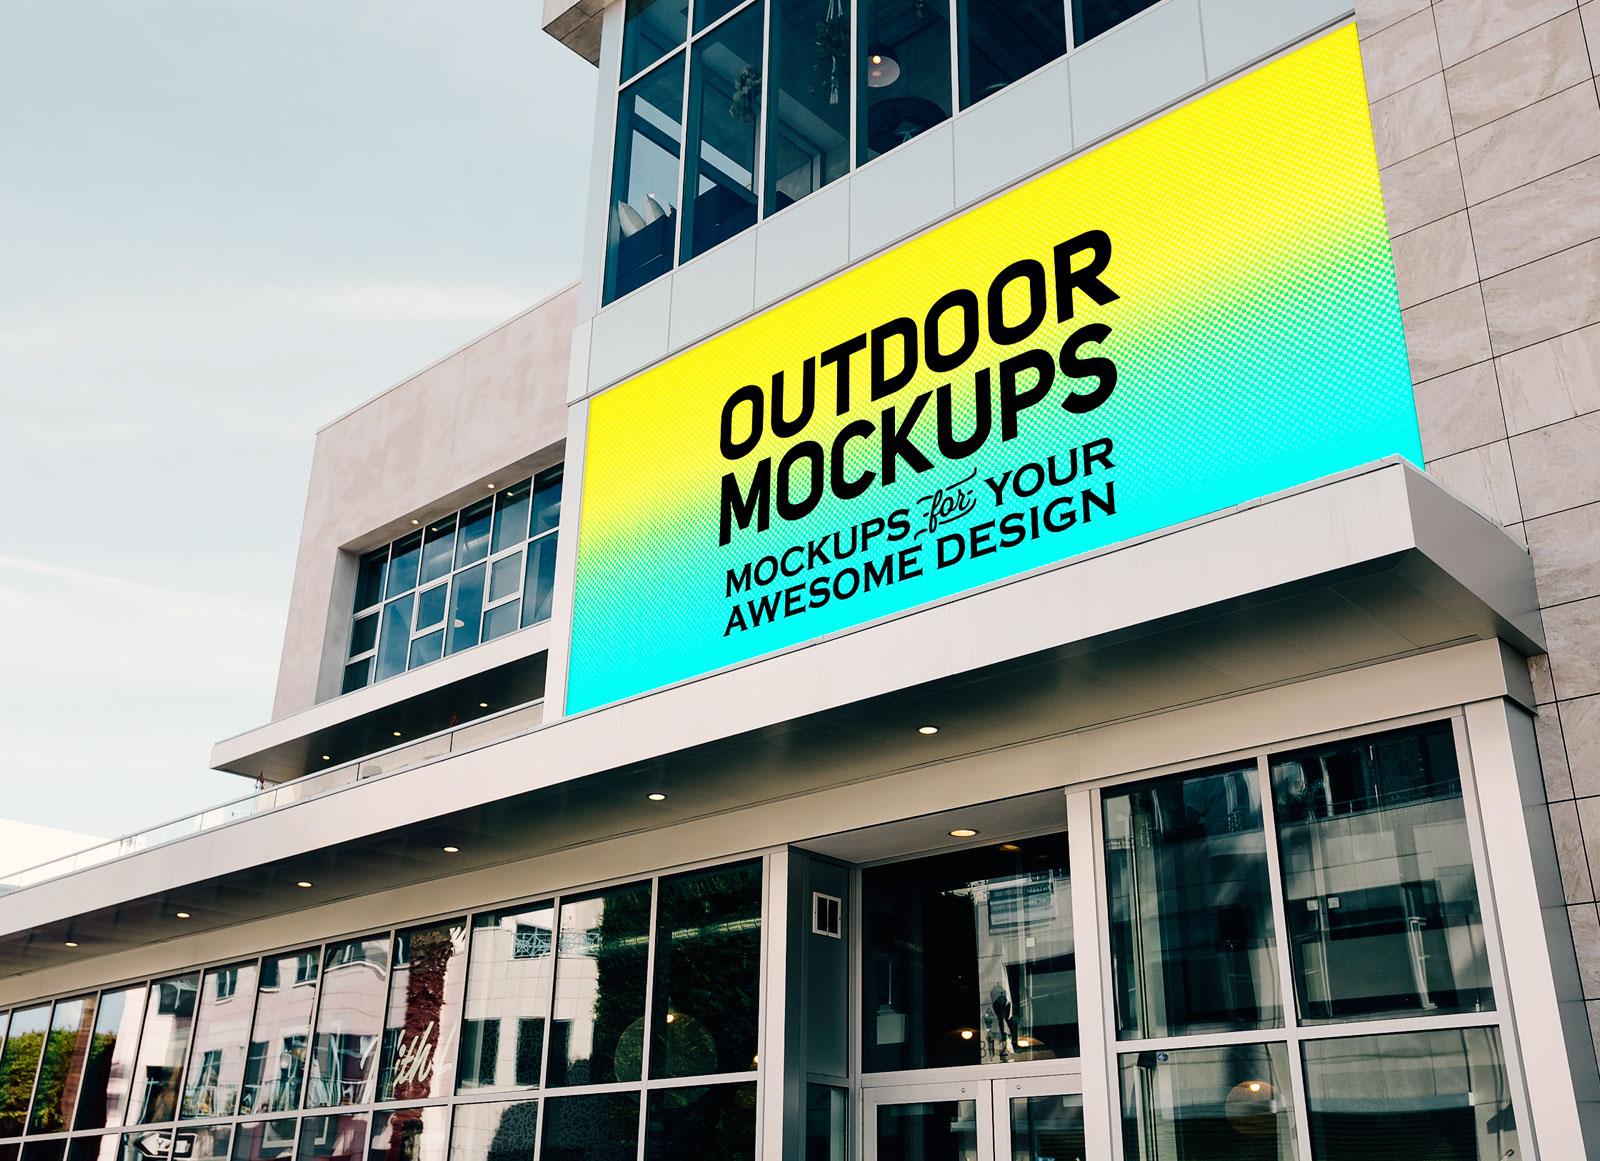 Free-Outdoor-Advertising-Building-Branding-Billboard-Mockup-PSD